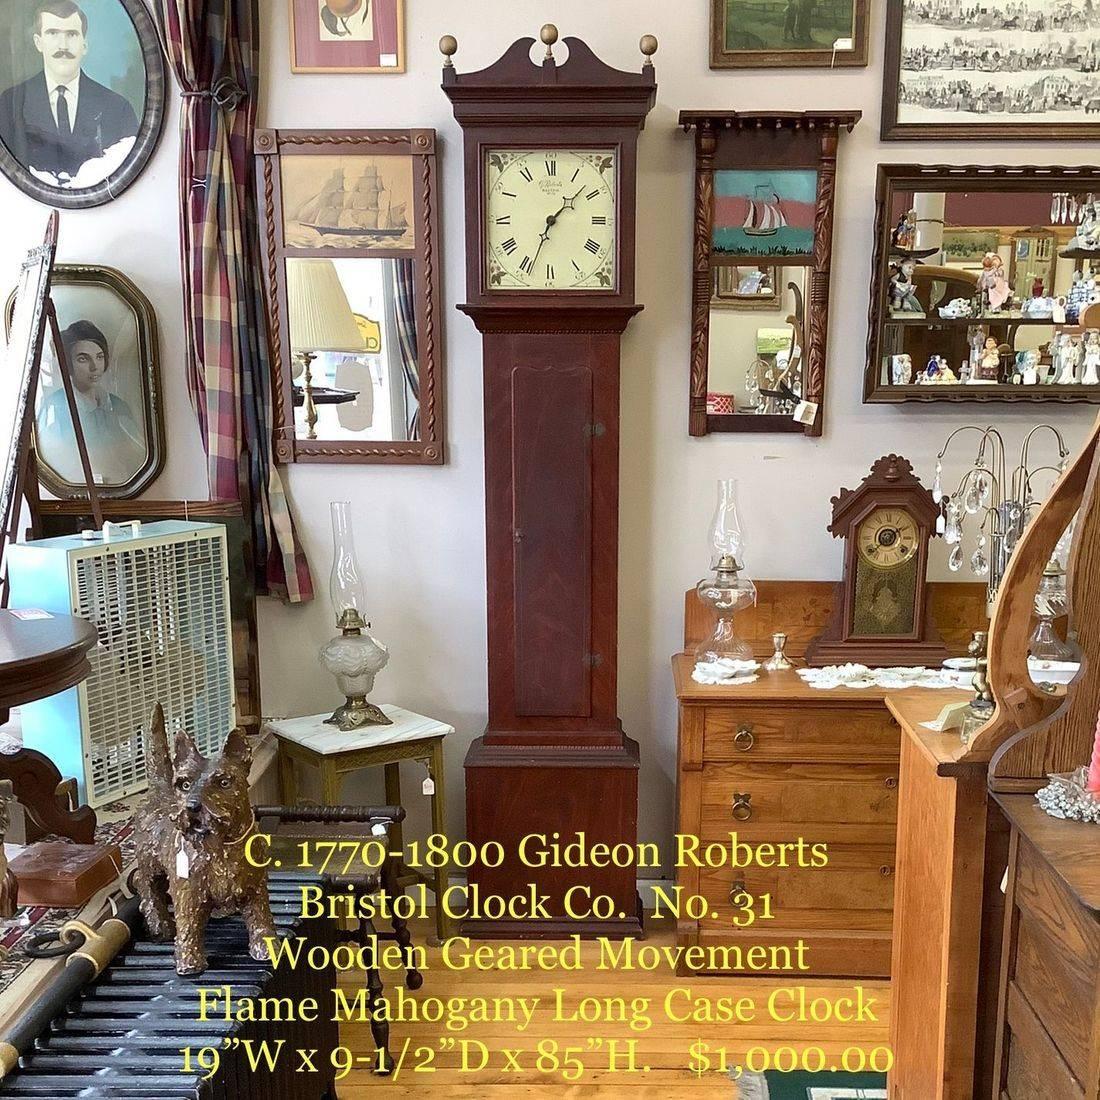 C. 1770-1800 Gideon Roberts, Bristol Clock Co. No. 31 Wooden Geared Movement, Flame Mahogany Long Case Clock   $1,000.00